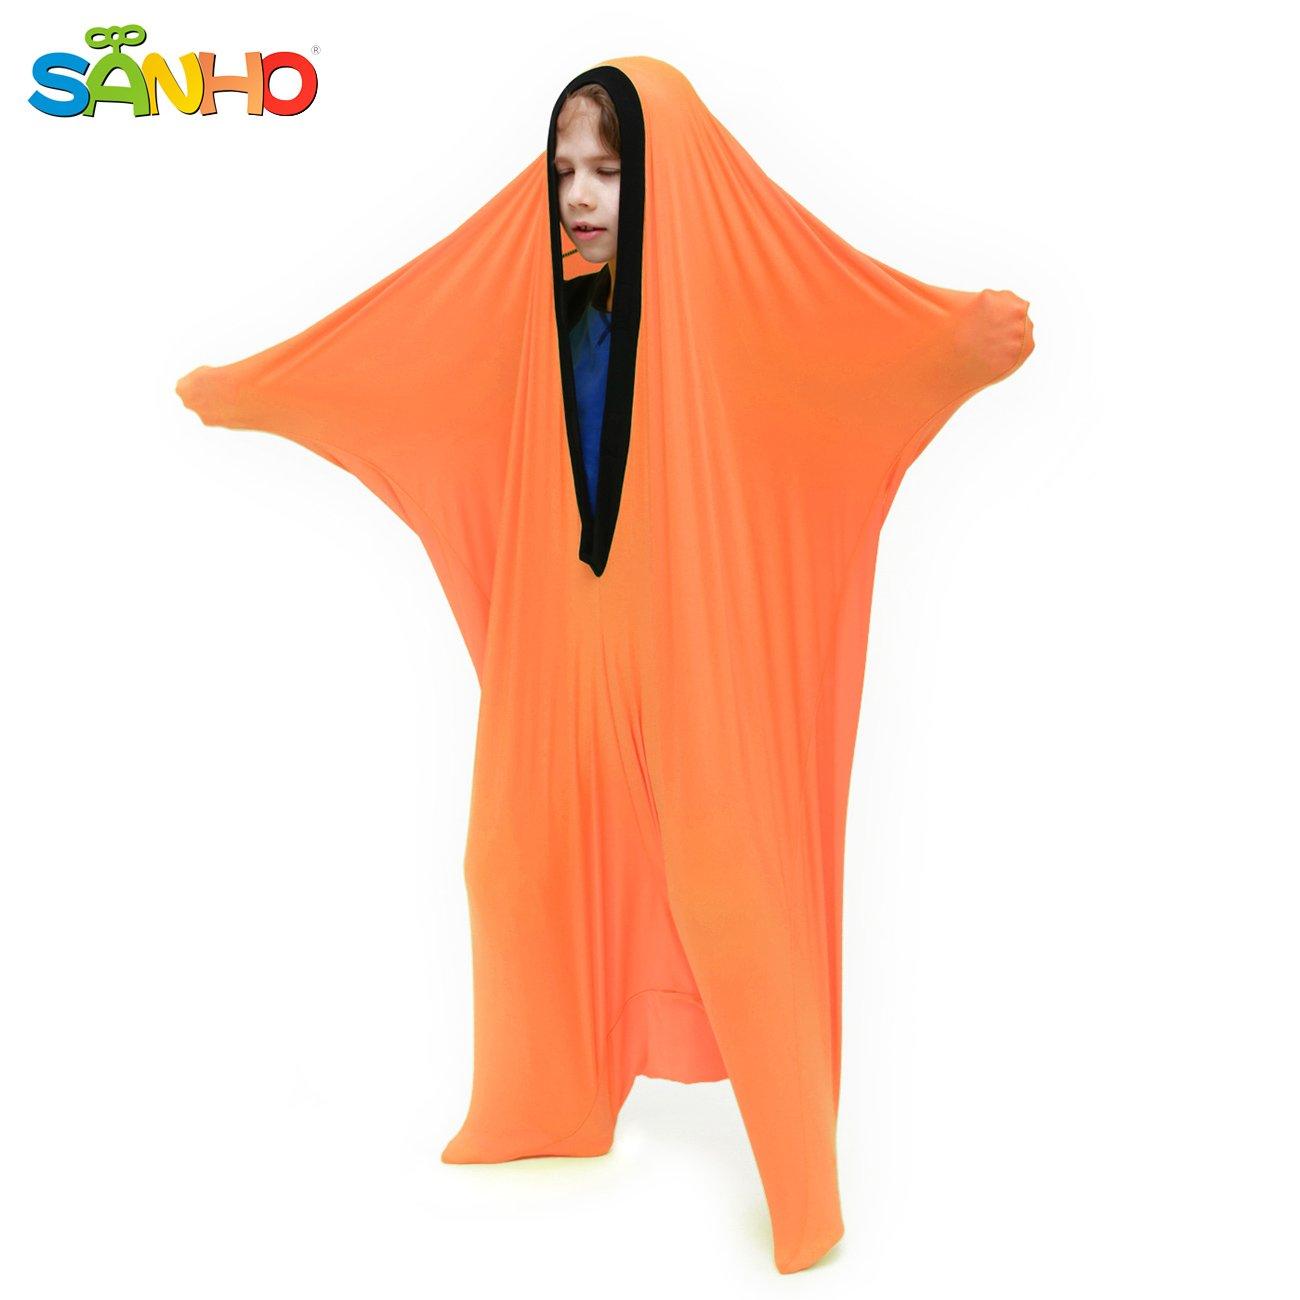 SANHO Dynamic Movement Sensory Sox, X-Large(Height Between 4'8''- 5'8''),Orange